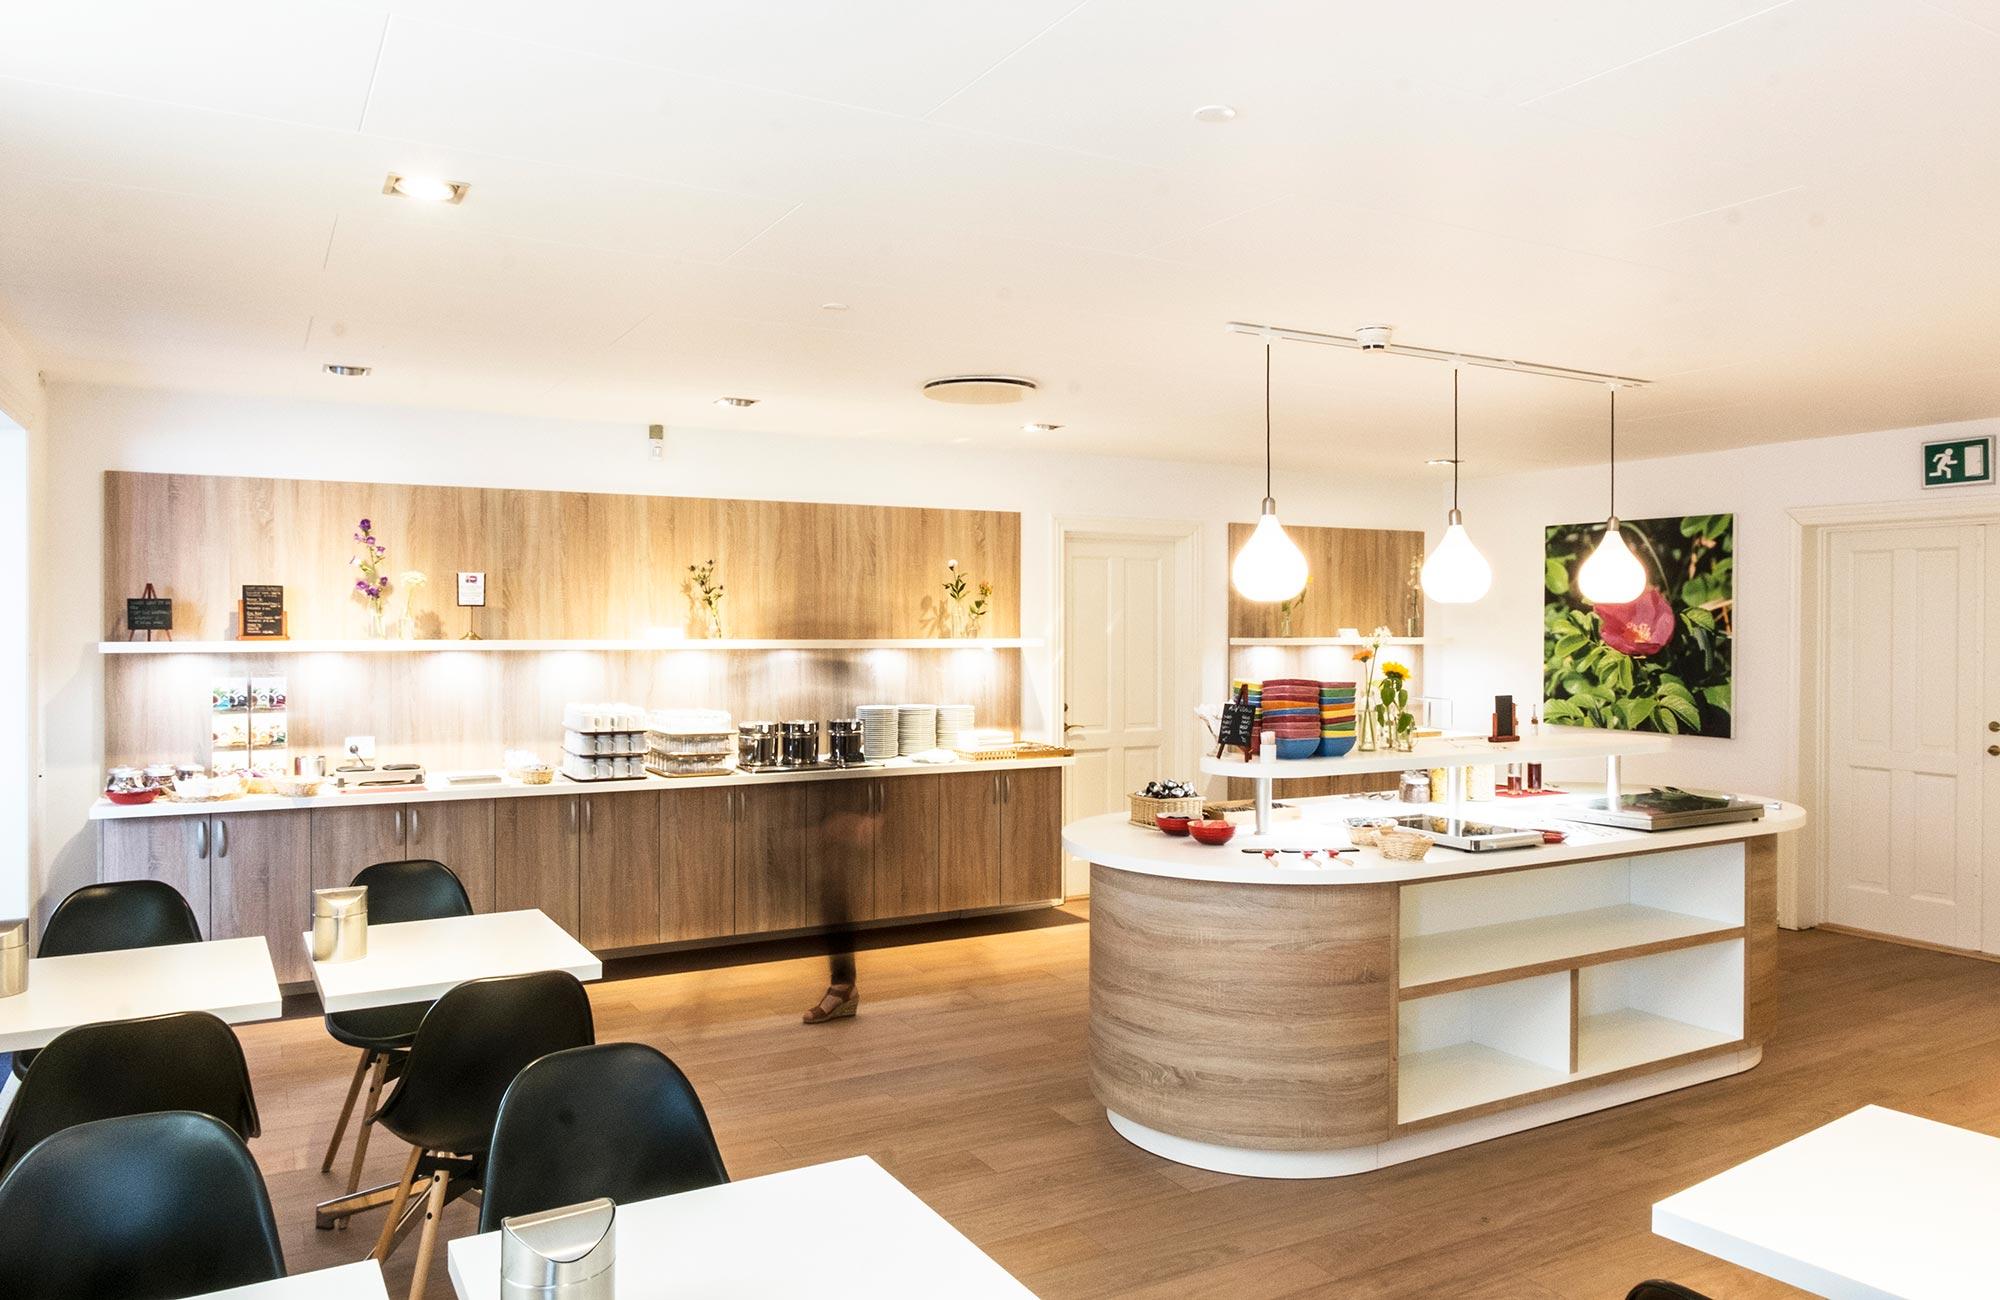 Hotel Petit, Skagen – Morgenmadsrestaurant